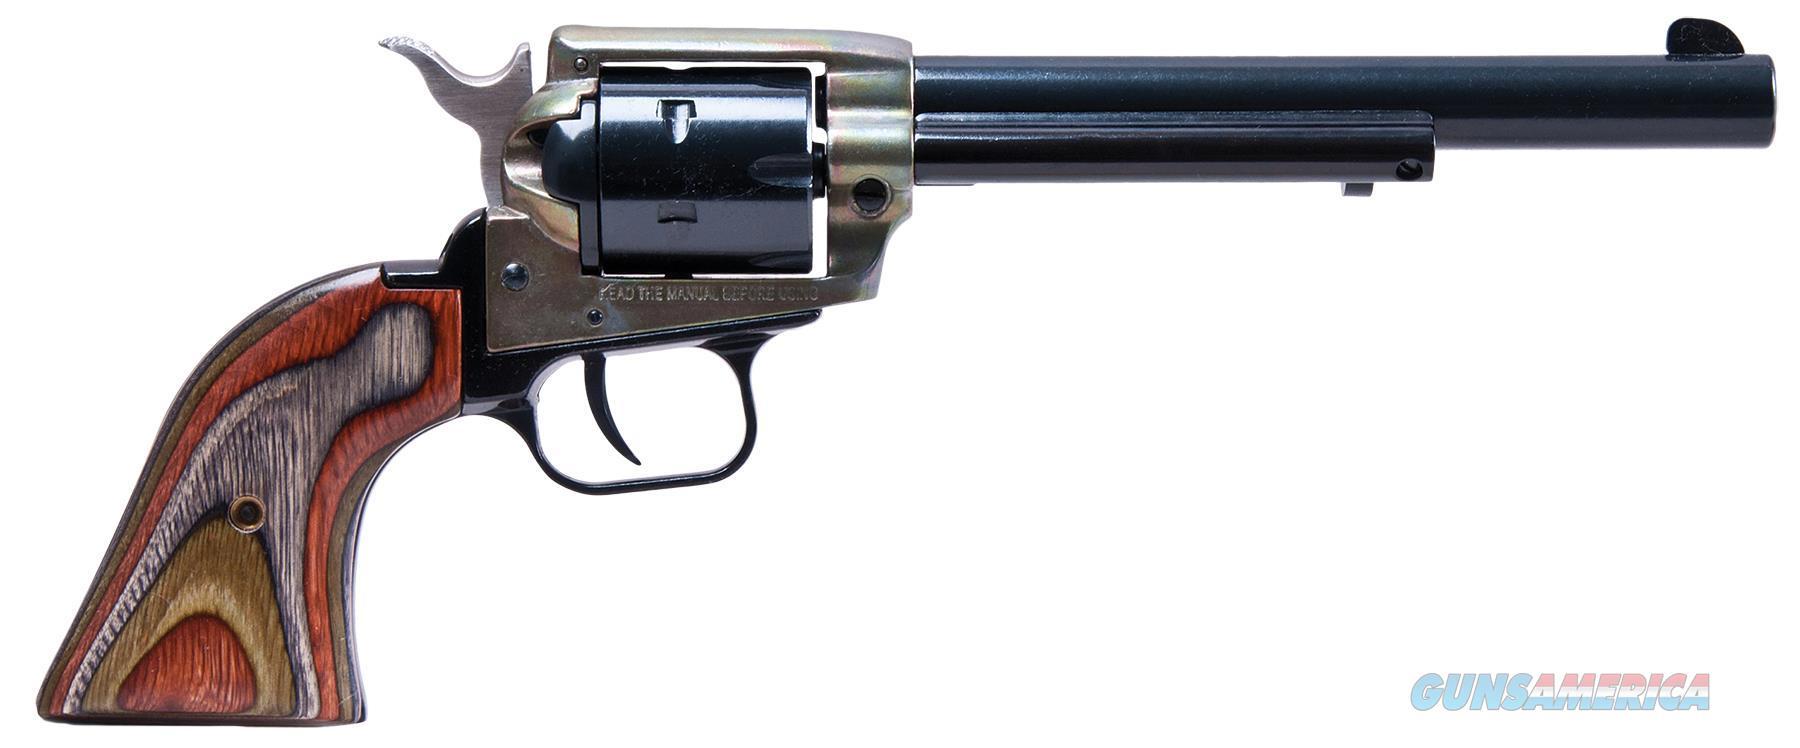 "Heritage Mfg Rr22mch6 Rough Rider Small Bore Single 22 Long Rifle 6.5"" 6 Camo Laminate Black RR22MCH6  Guns > Pistols > Heritage"